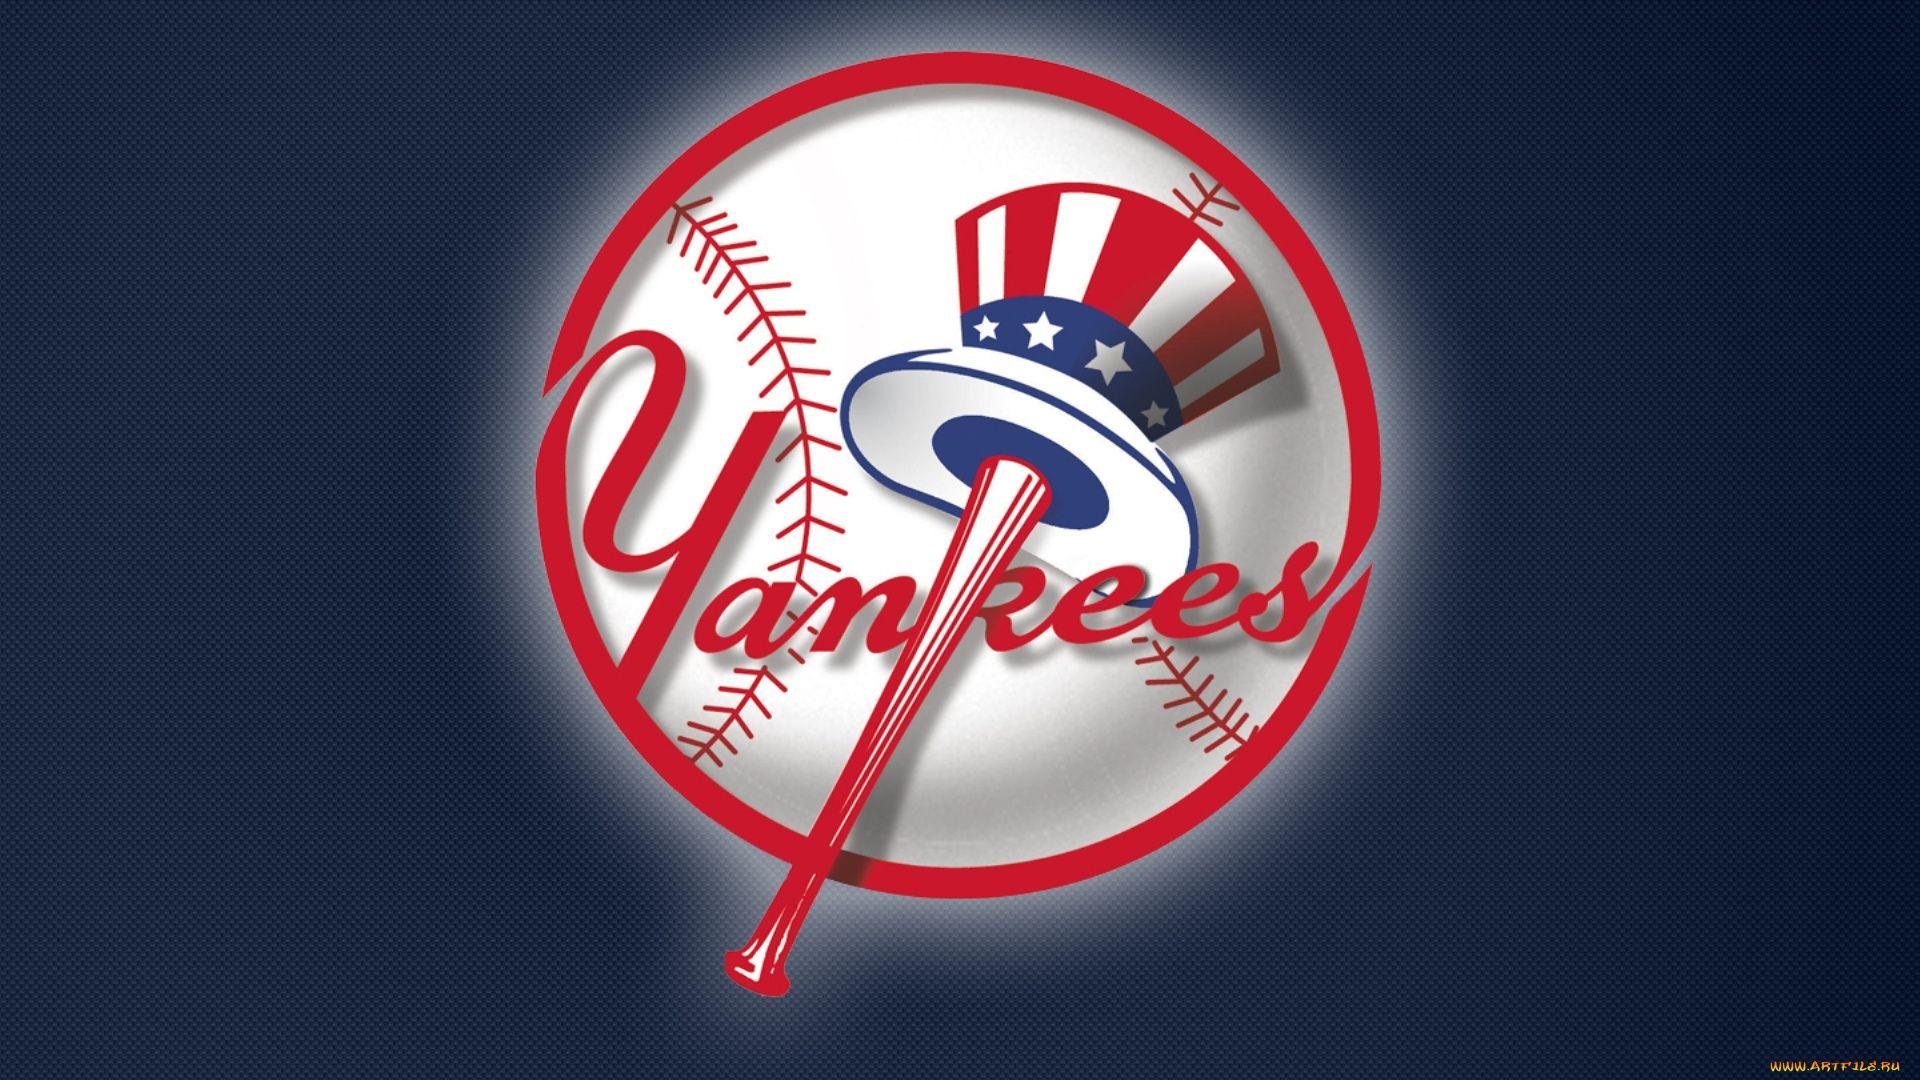 New York Yankees image